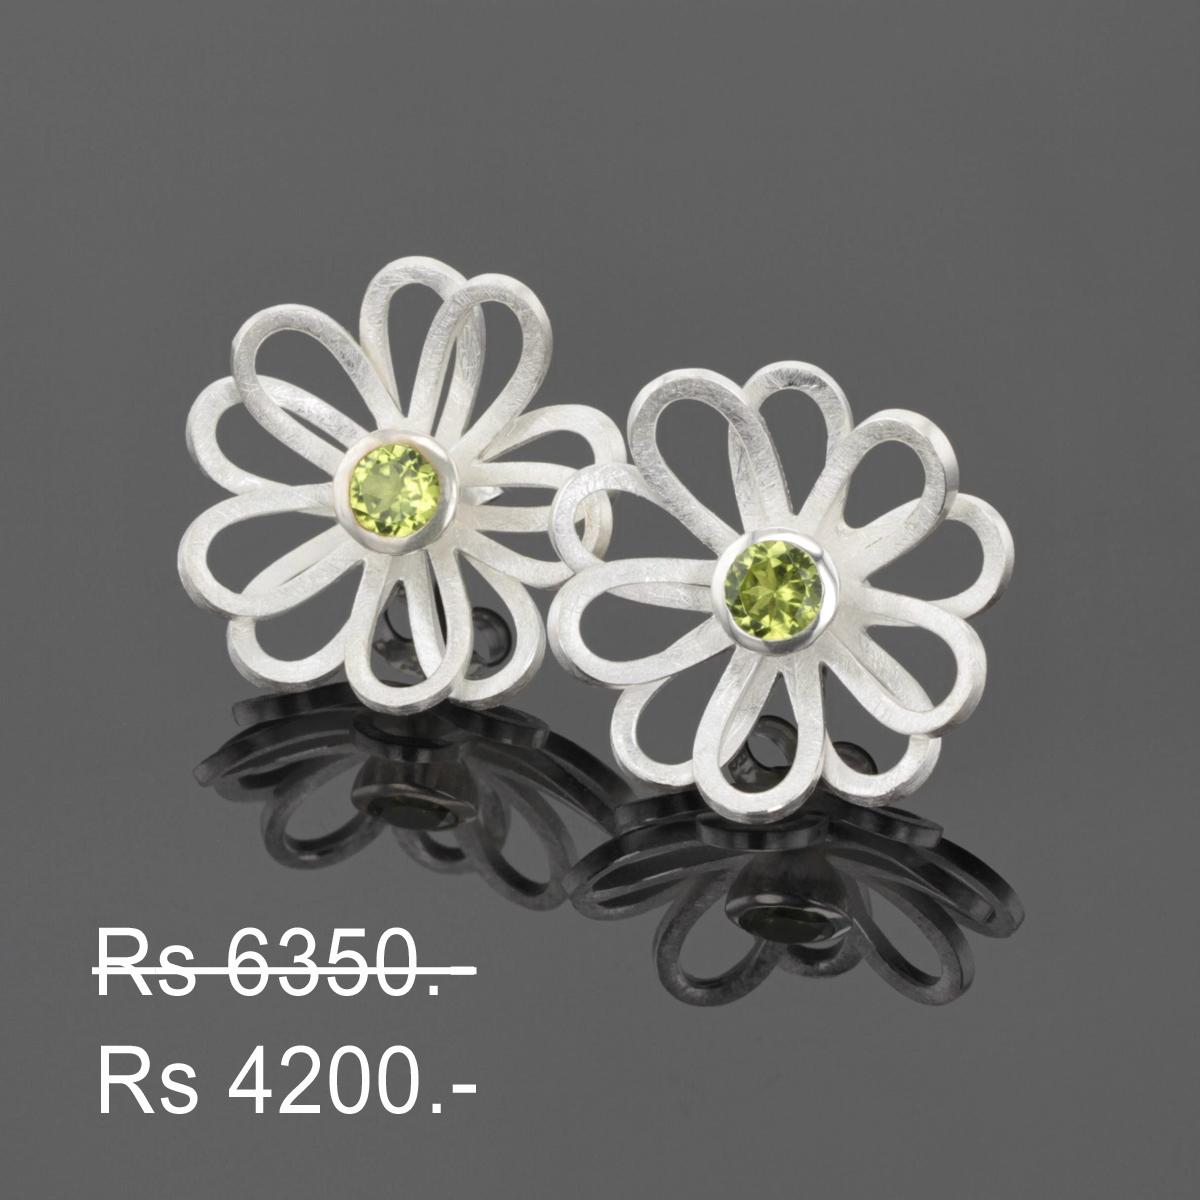 Discounted silver earrings